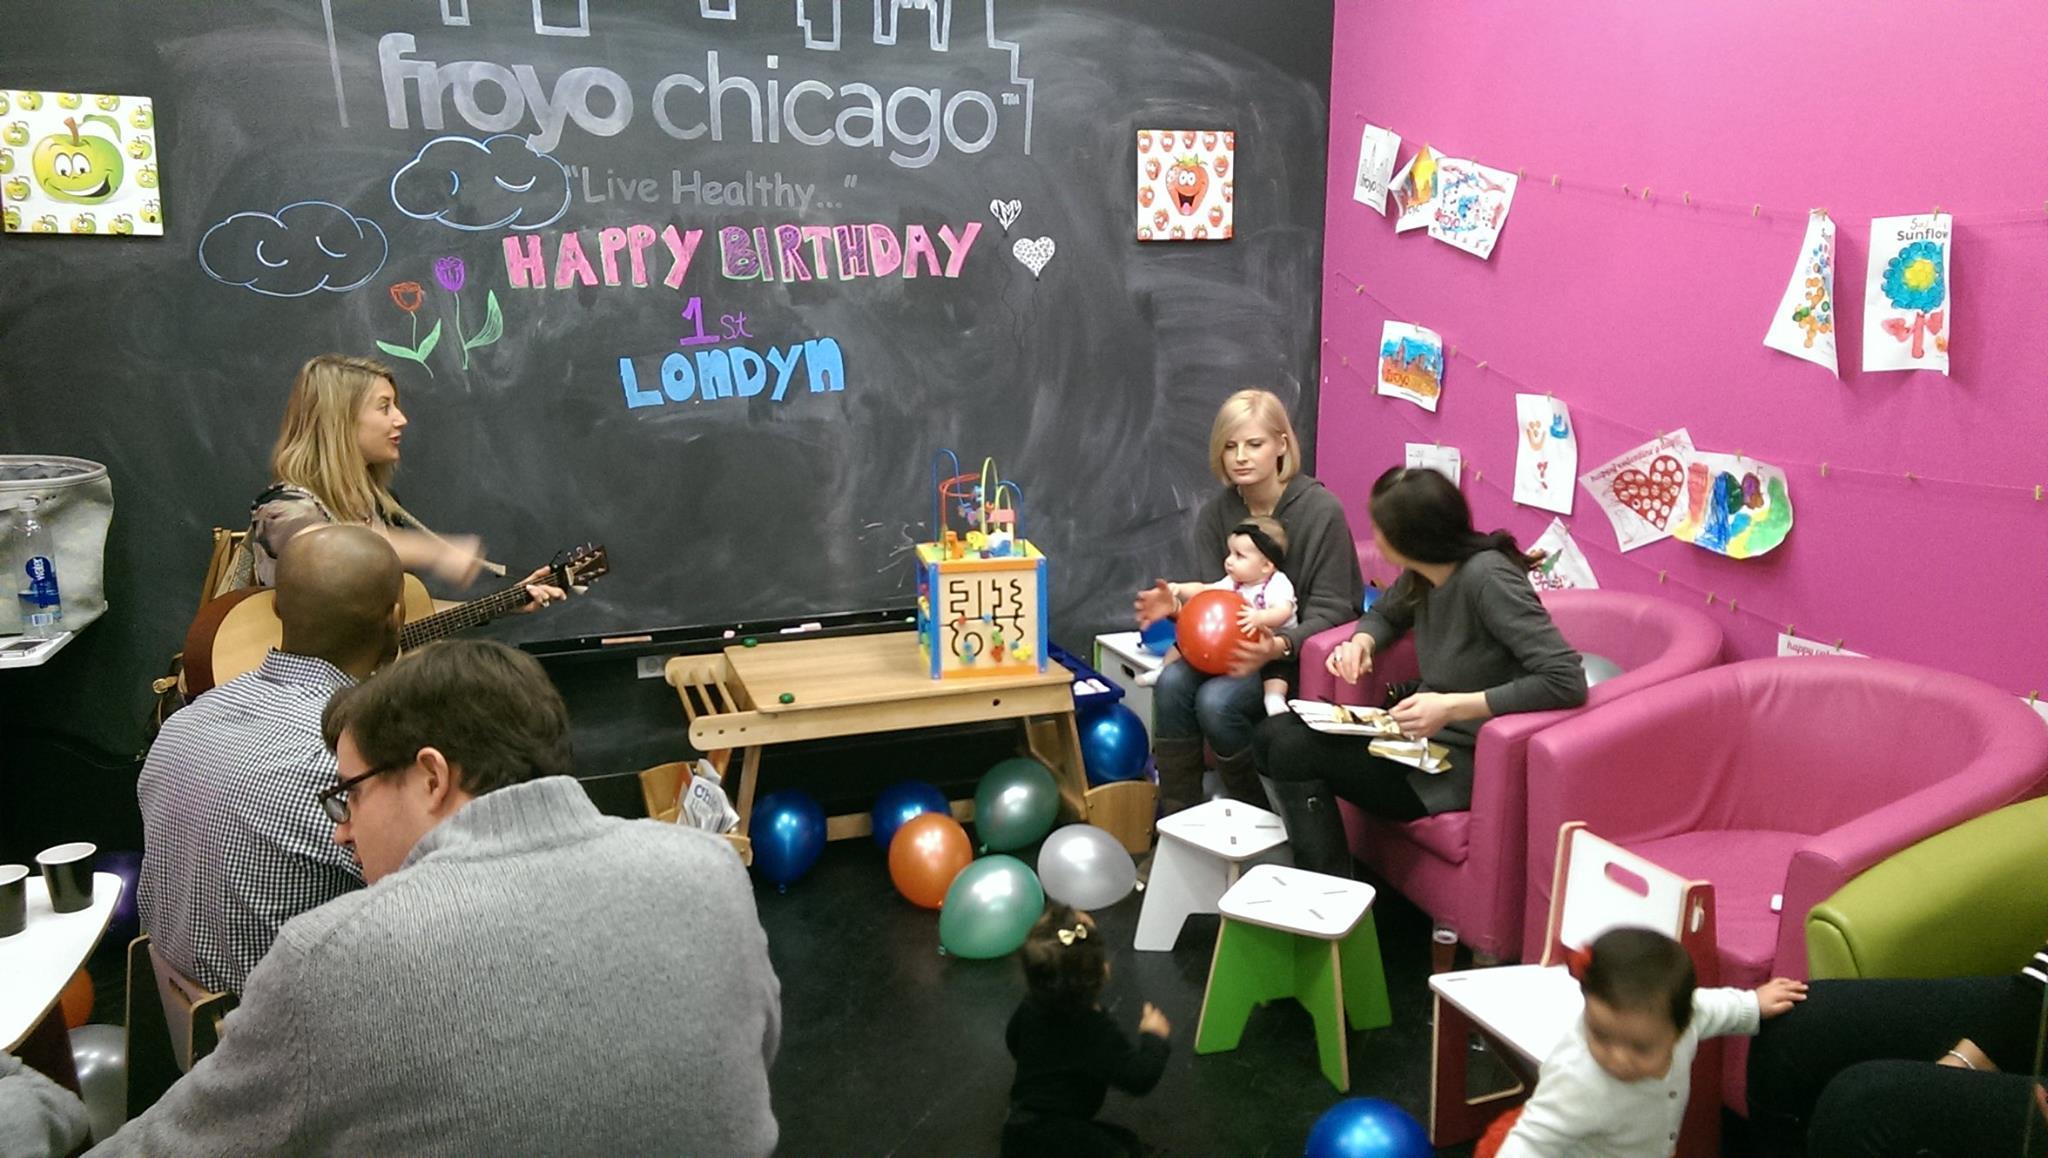 Yogurt and playtime at FroYo Chicago